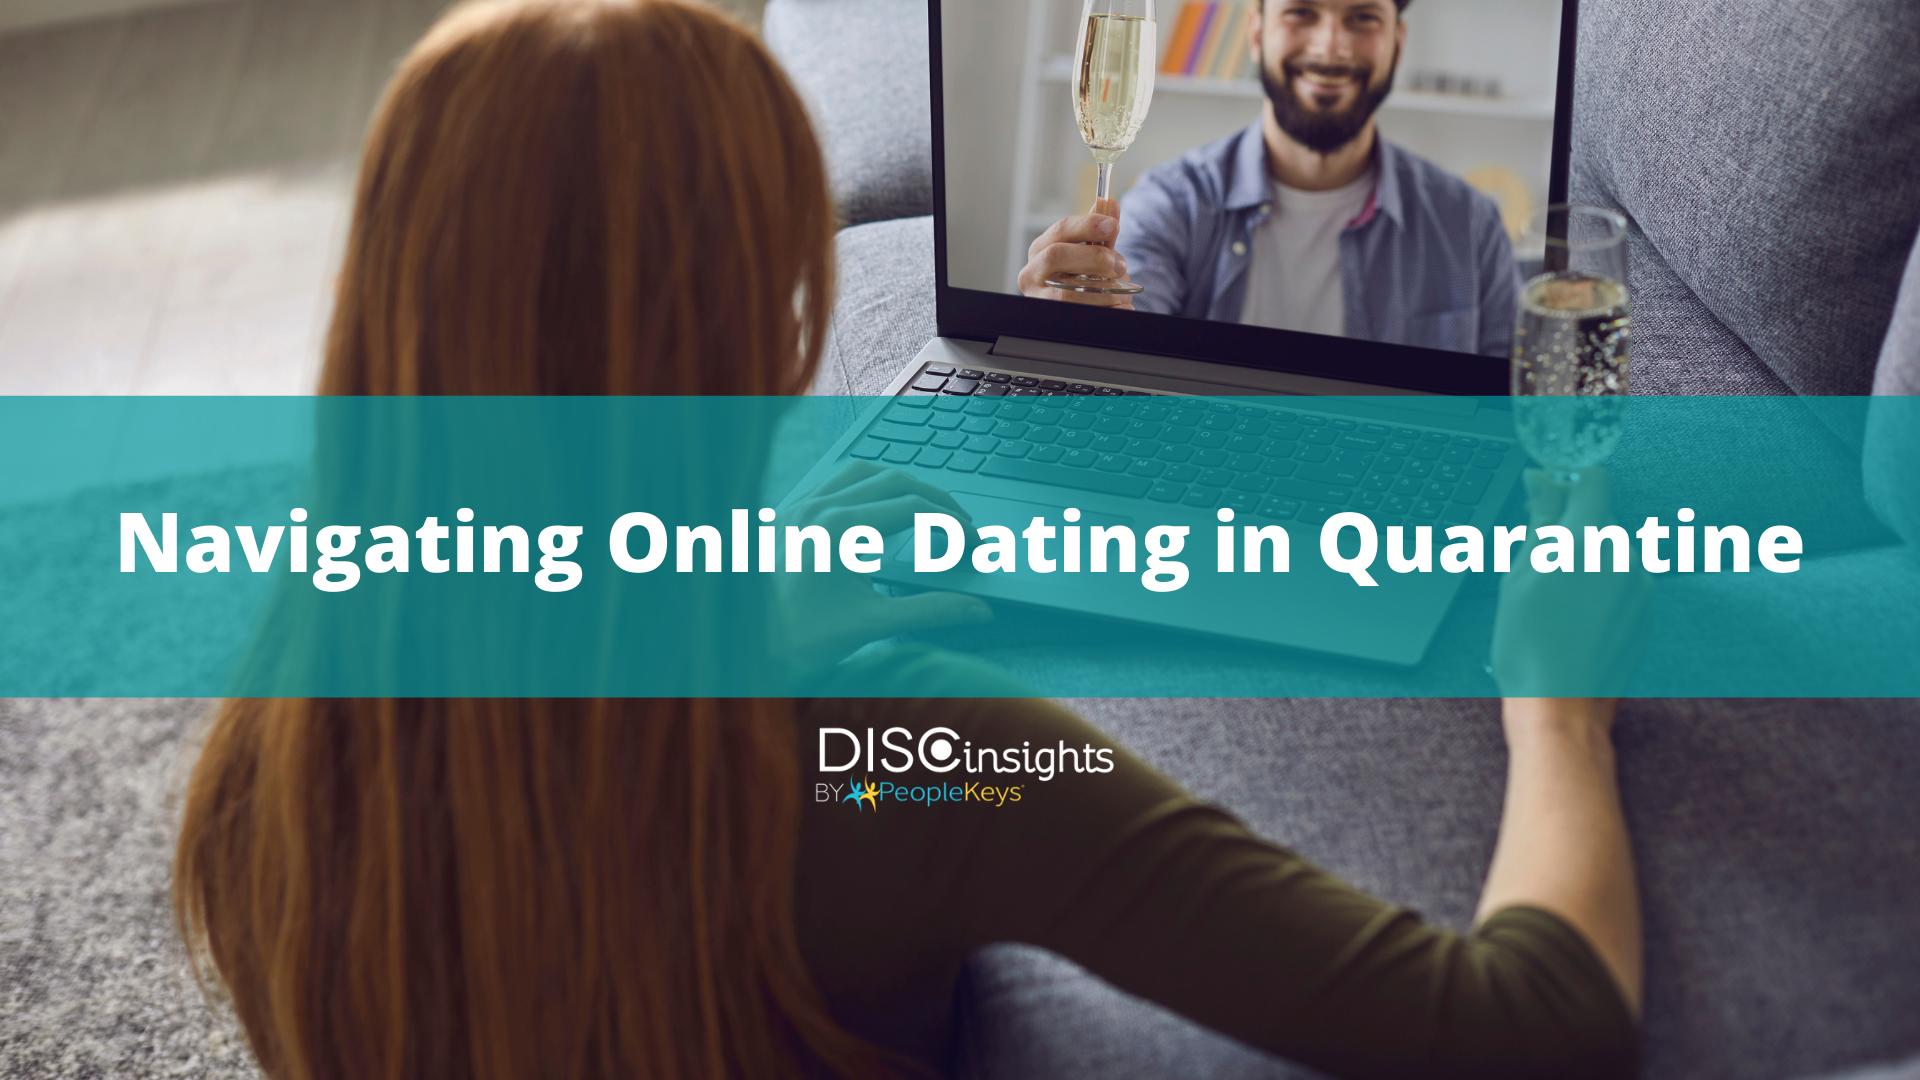 Navigating Online Dating in Quarantine